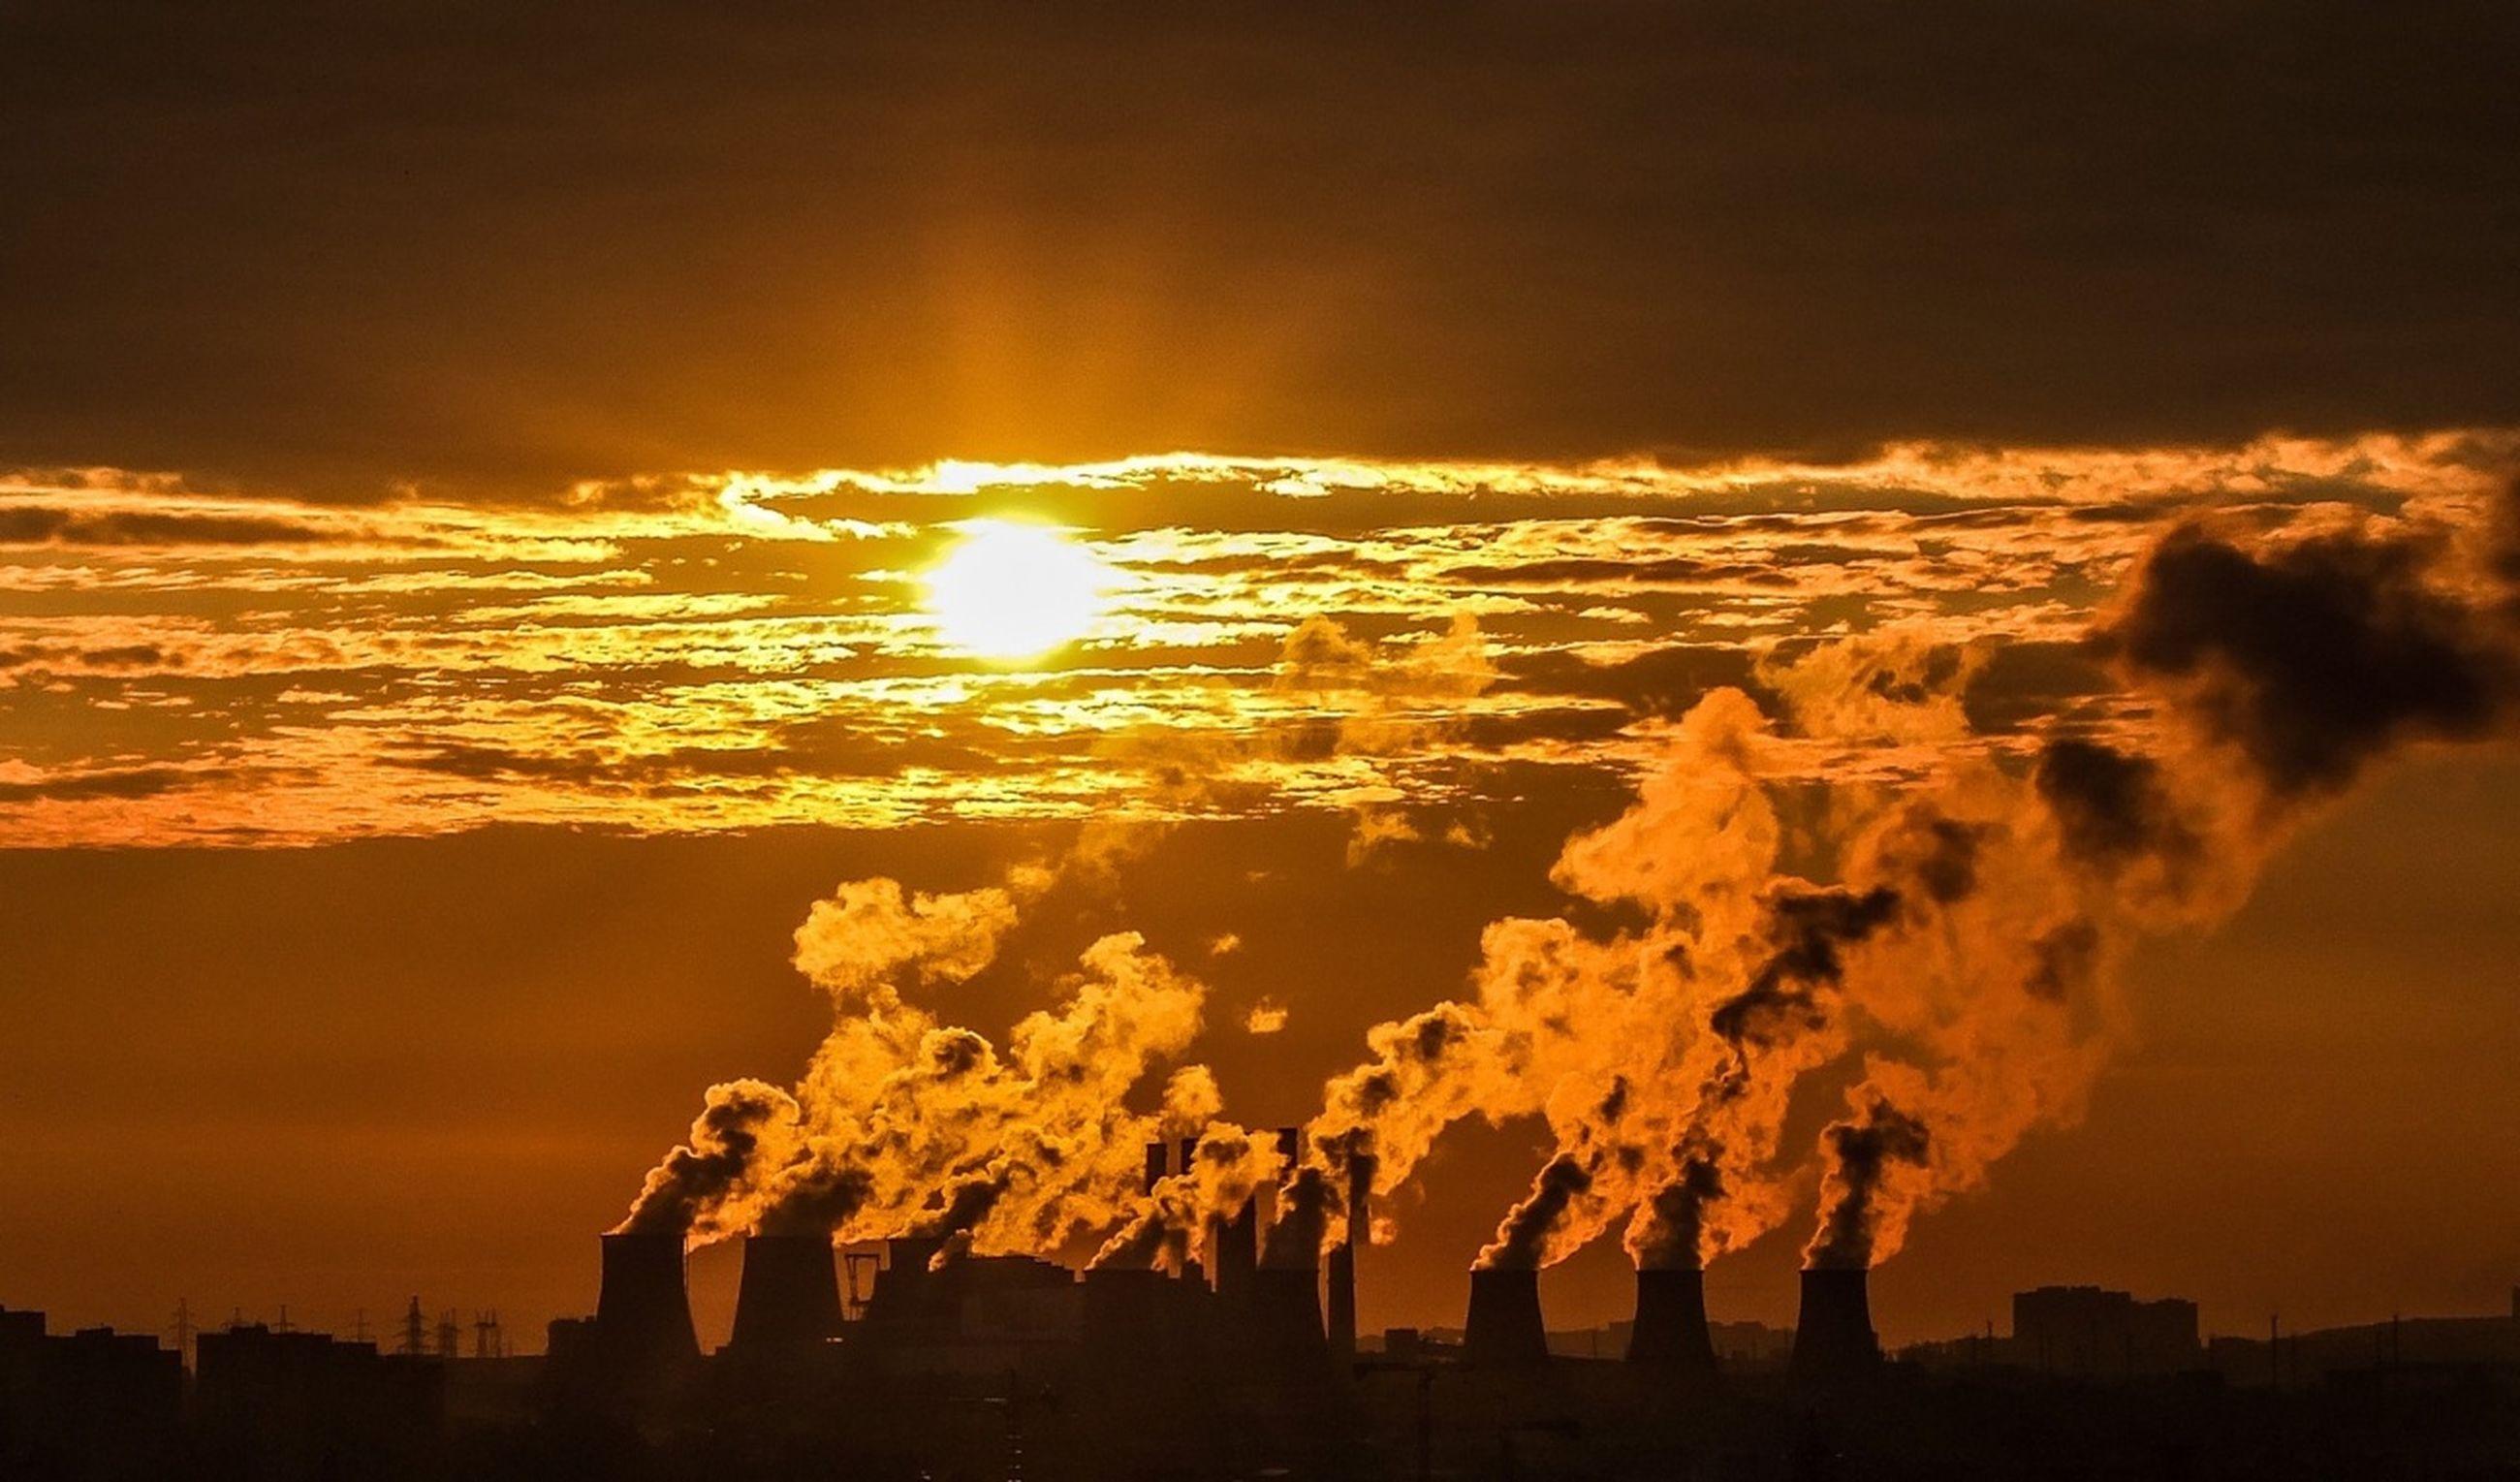 sunset, architecture, building exterior, sky, built structure, silhouette, orange color, sun, city, cloud - sky, scenics, beauty in nature, cityscape, nature, sunlight, outdoors, dramatic sky, cloud, no people, building